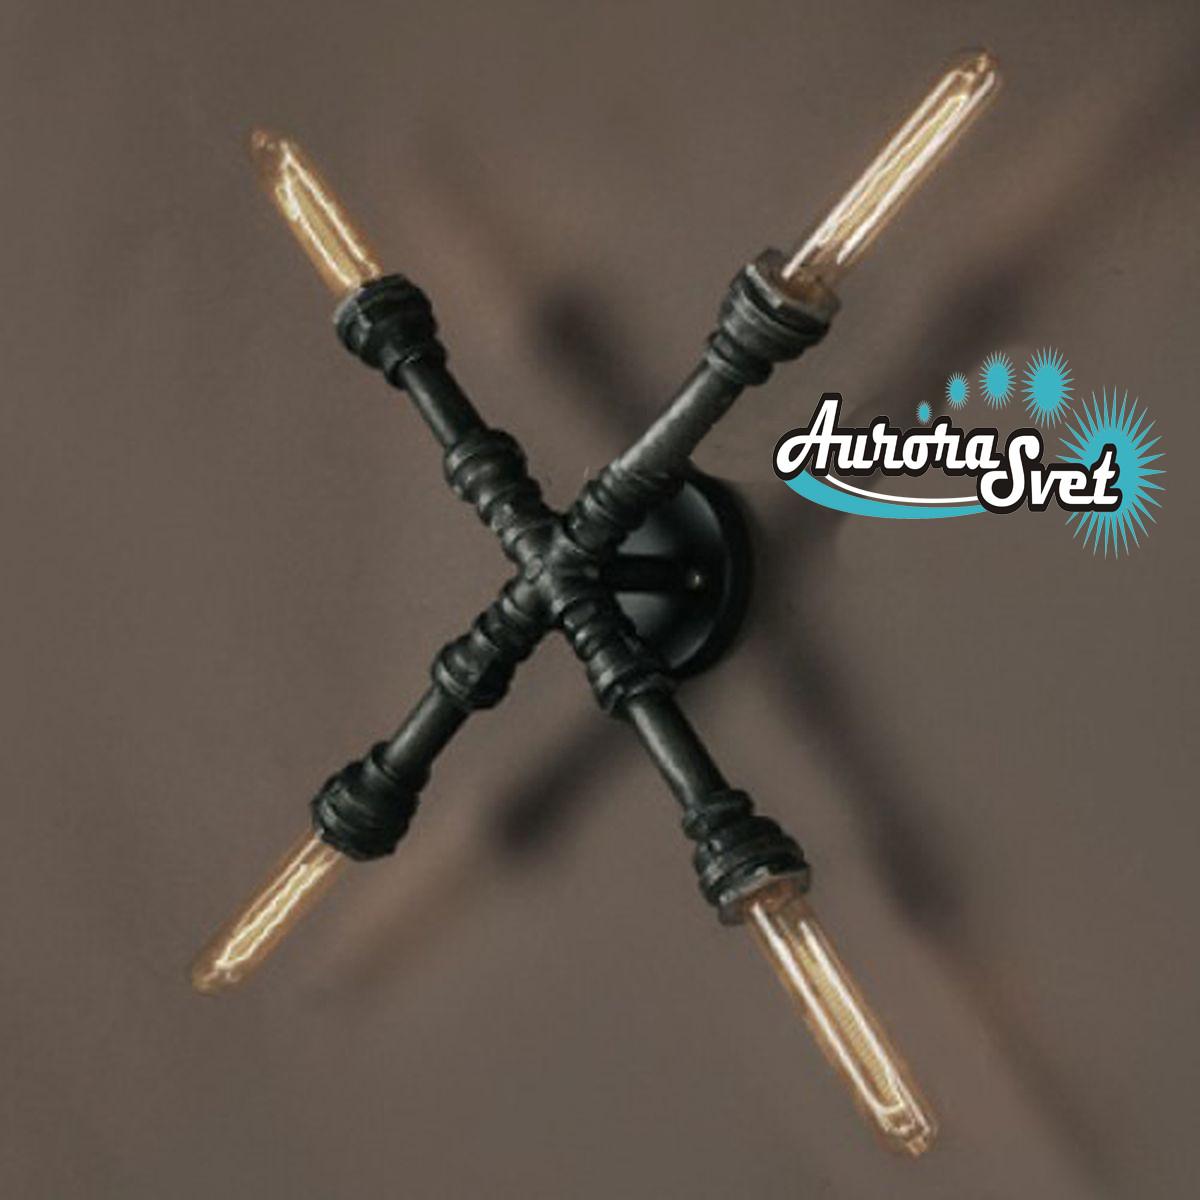 Бра настенная AuroraSvet loft 10300 чёрная.LED светильник бра. Светодиодный светильник бра.